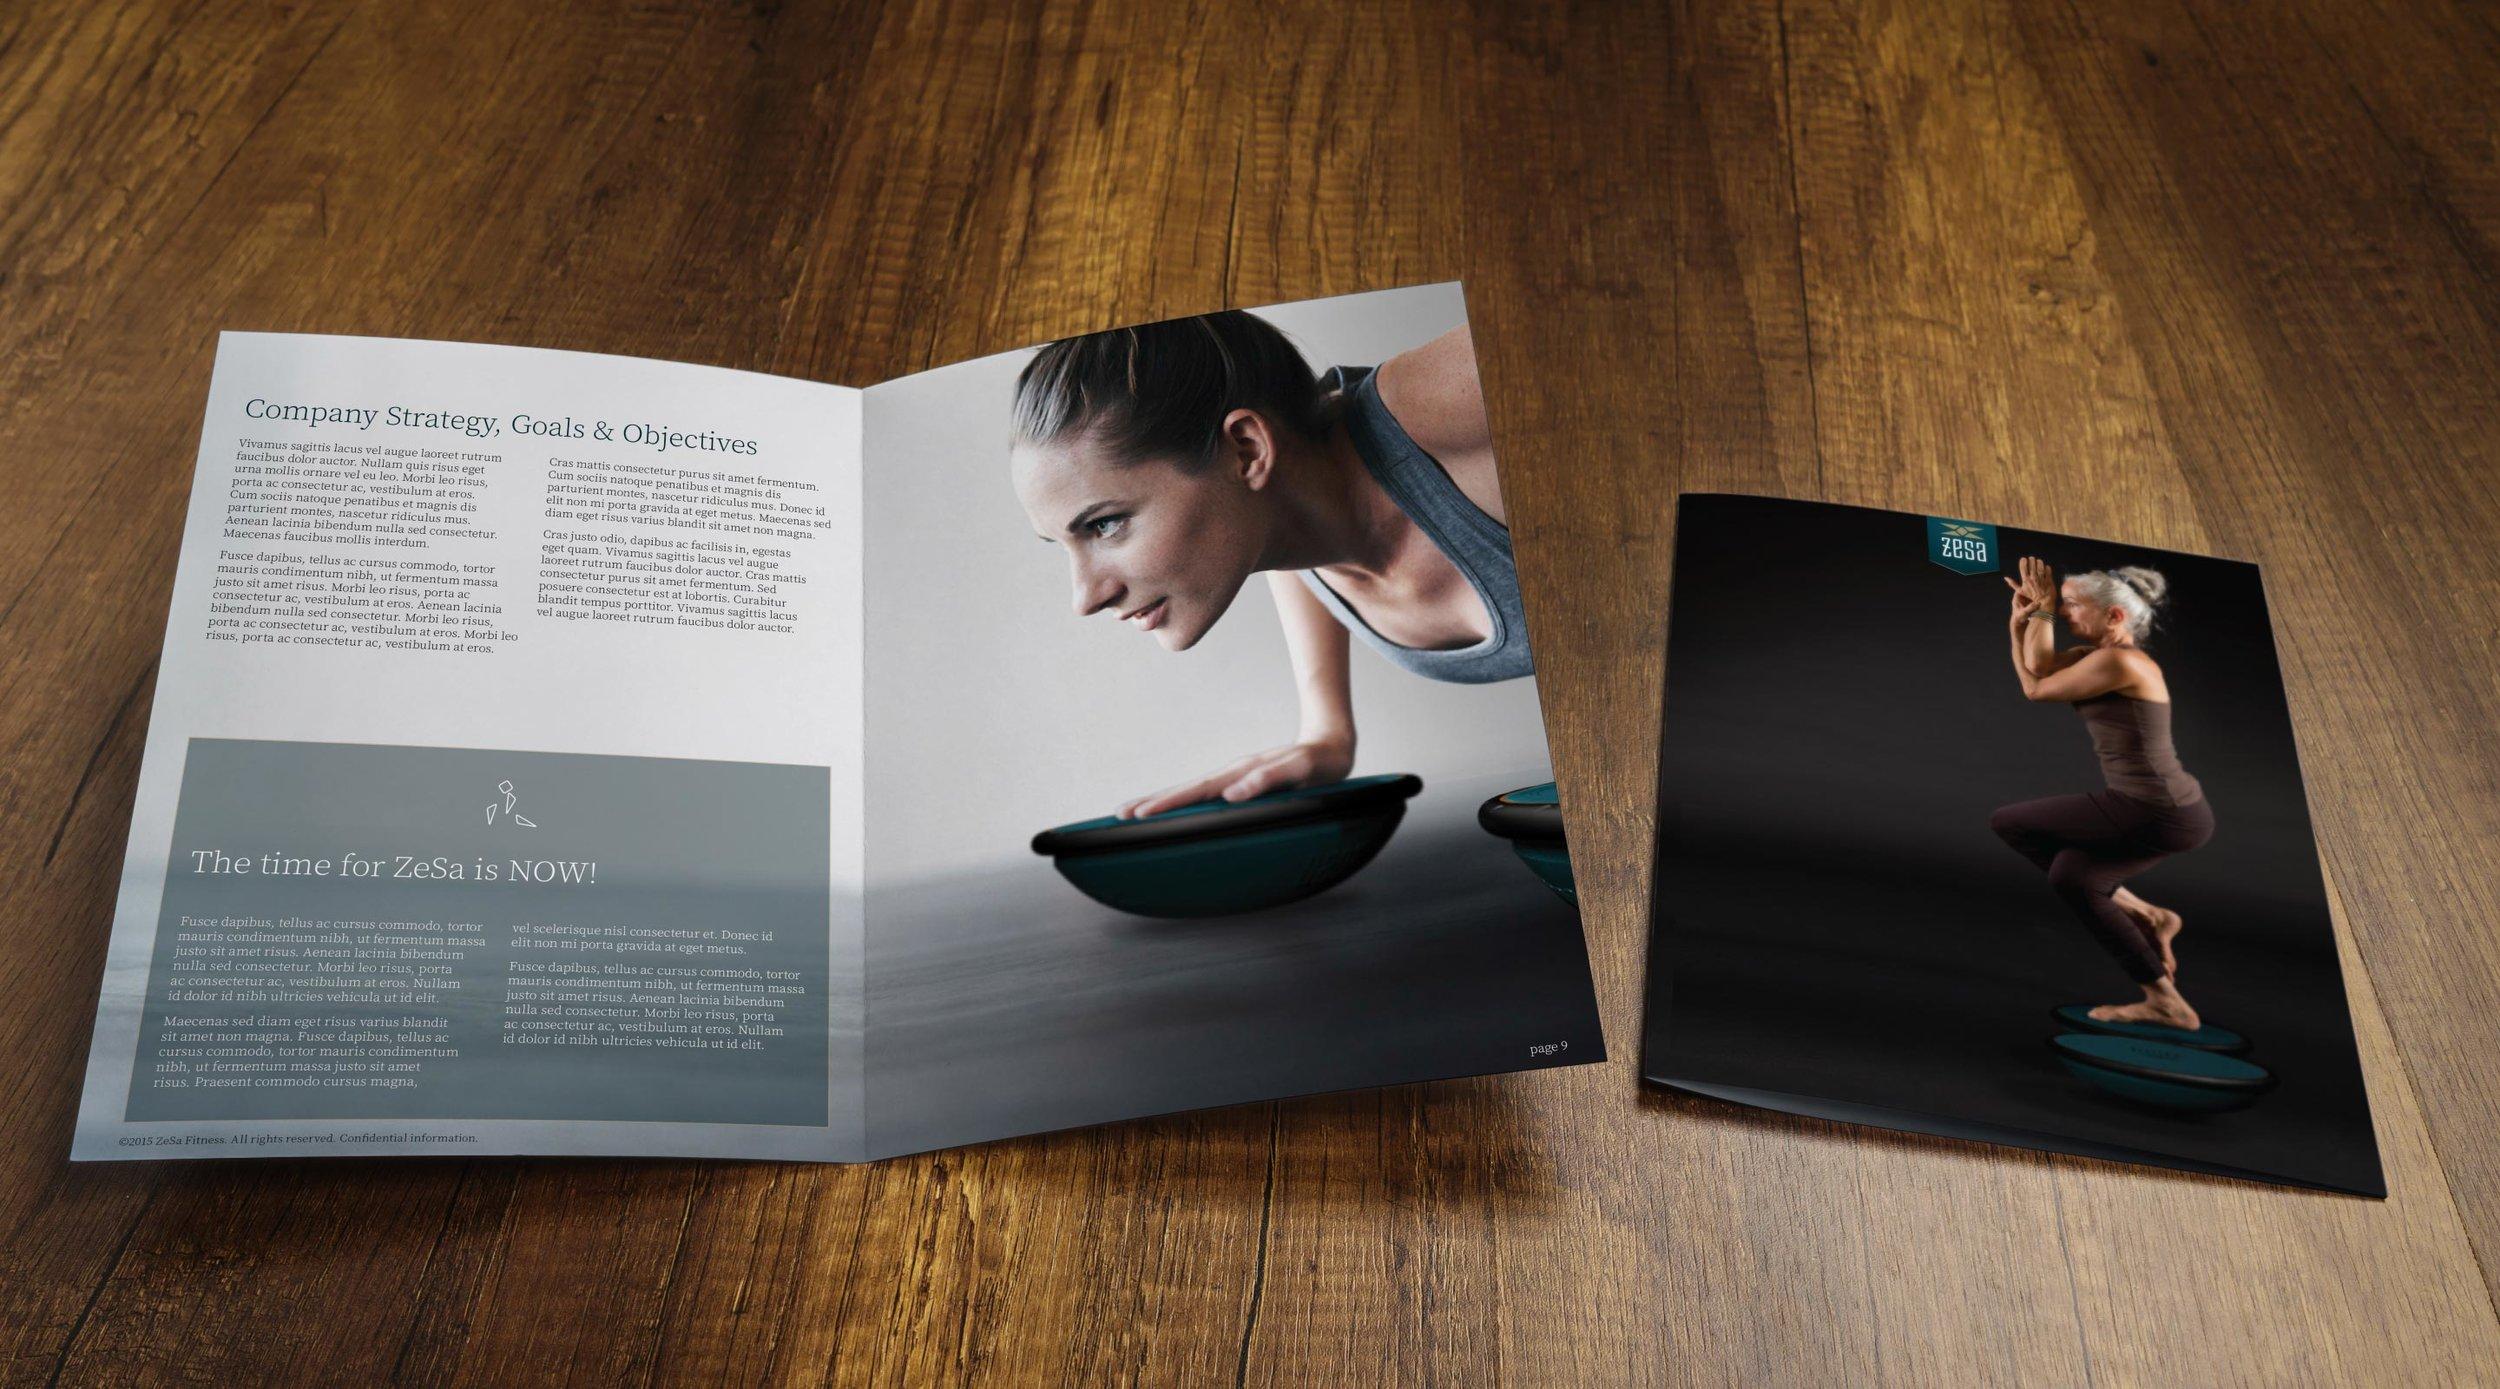 zesa-fitness-brochure-pricesheet-catalog-branding-print-3-2880x1800.jpg